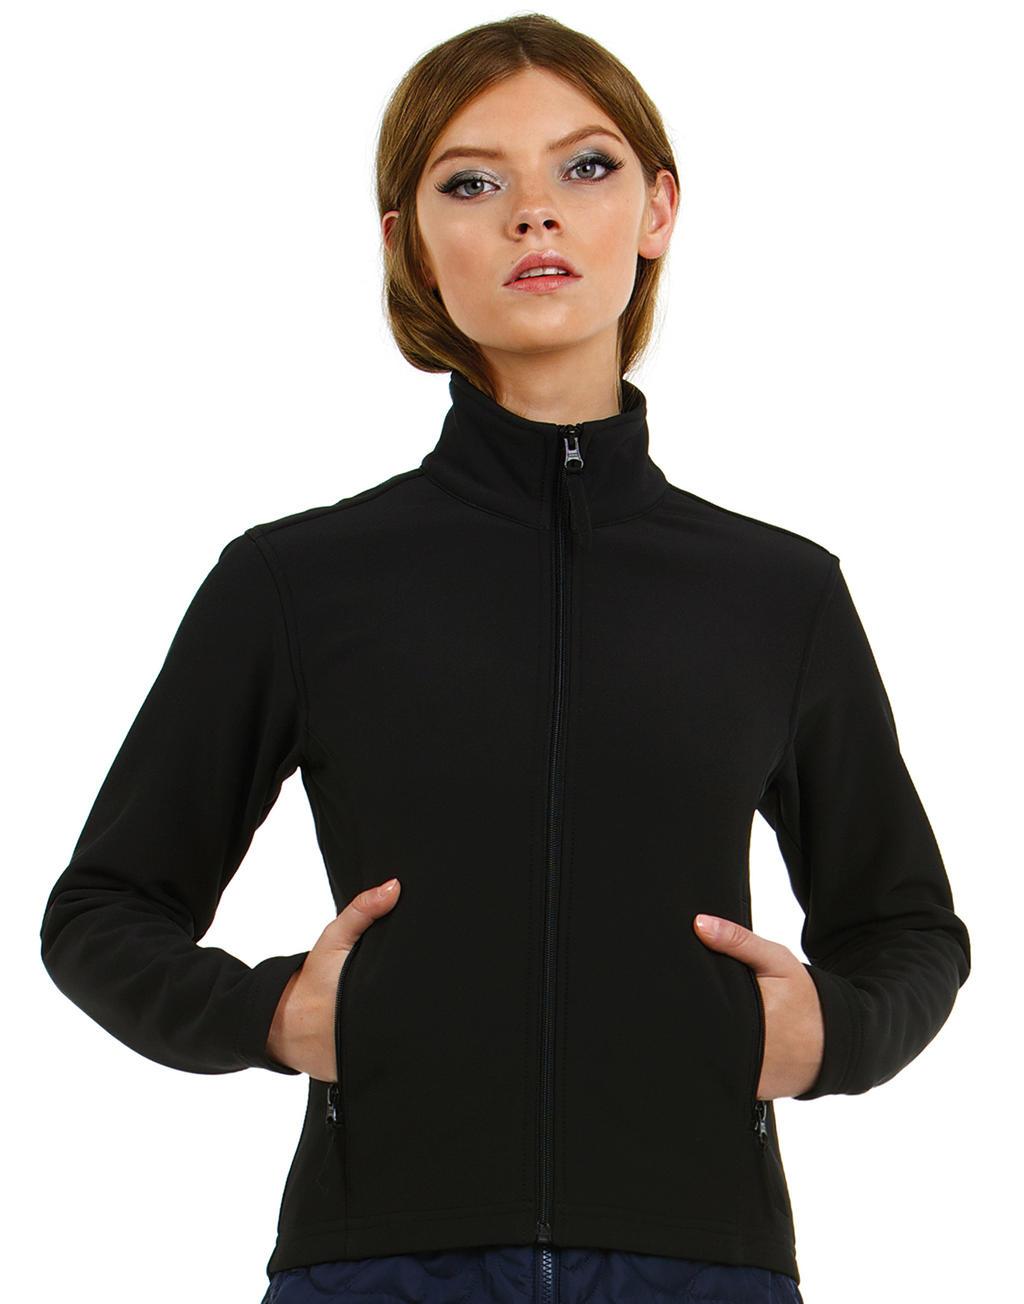 JWI63 Dámska Softshellová bunda ID.701/women